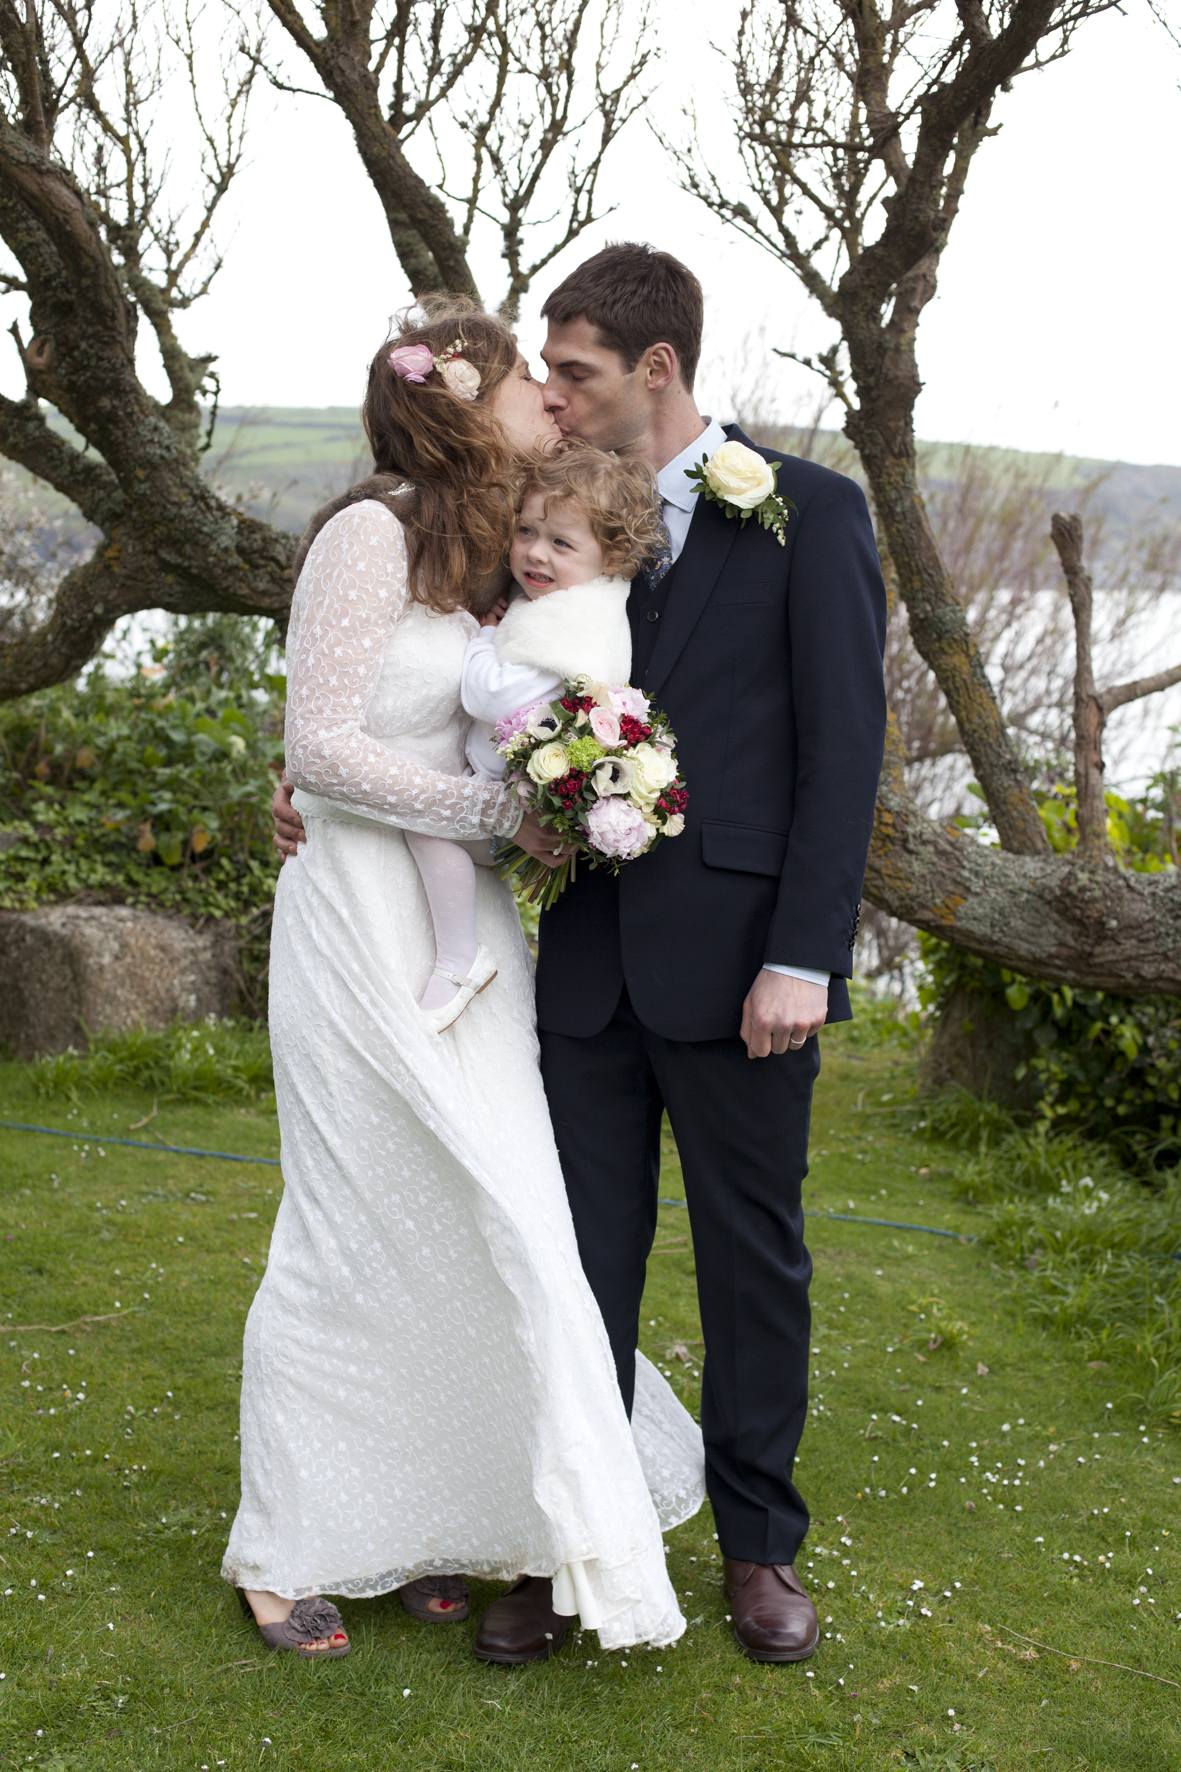 Wedding example_M&P__MG_4031_Claudia Leisinger.jpg